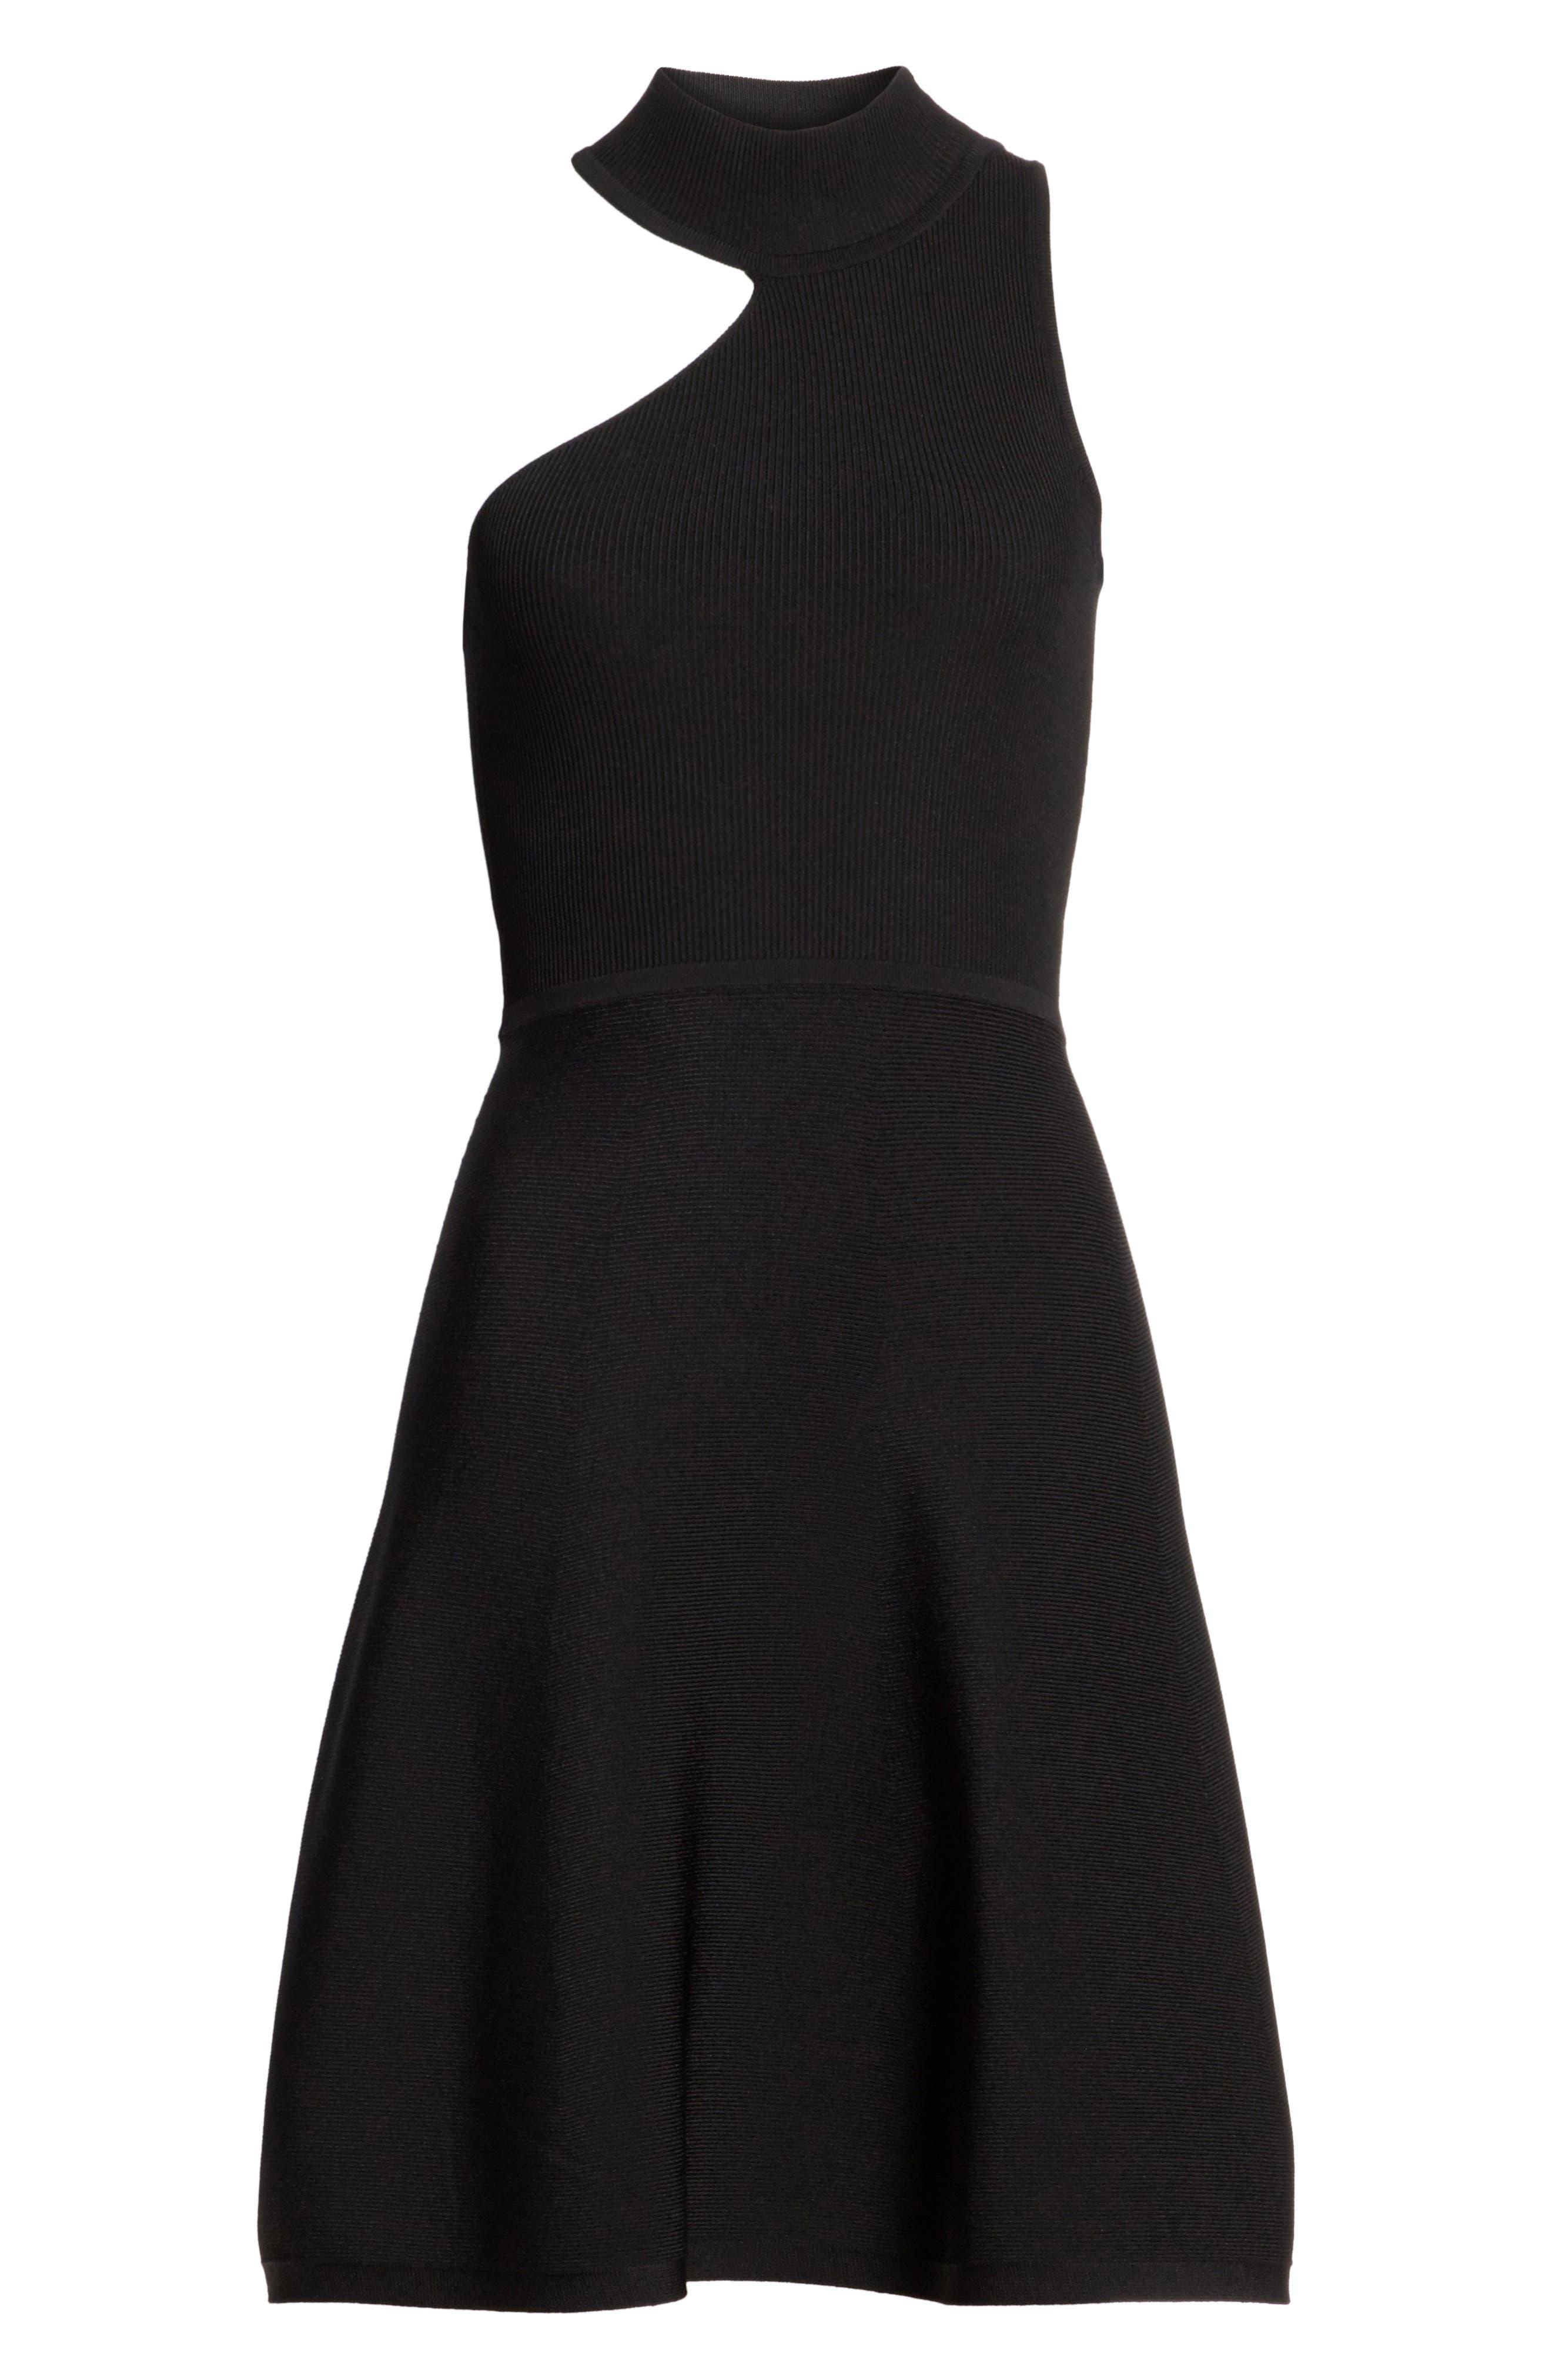 Vika One-Shoulder Knit Flare Dress,                             Alternate thumbnail 6, color,                             001